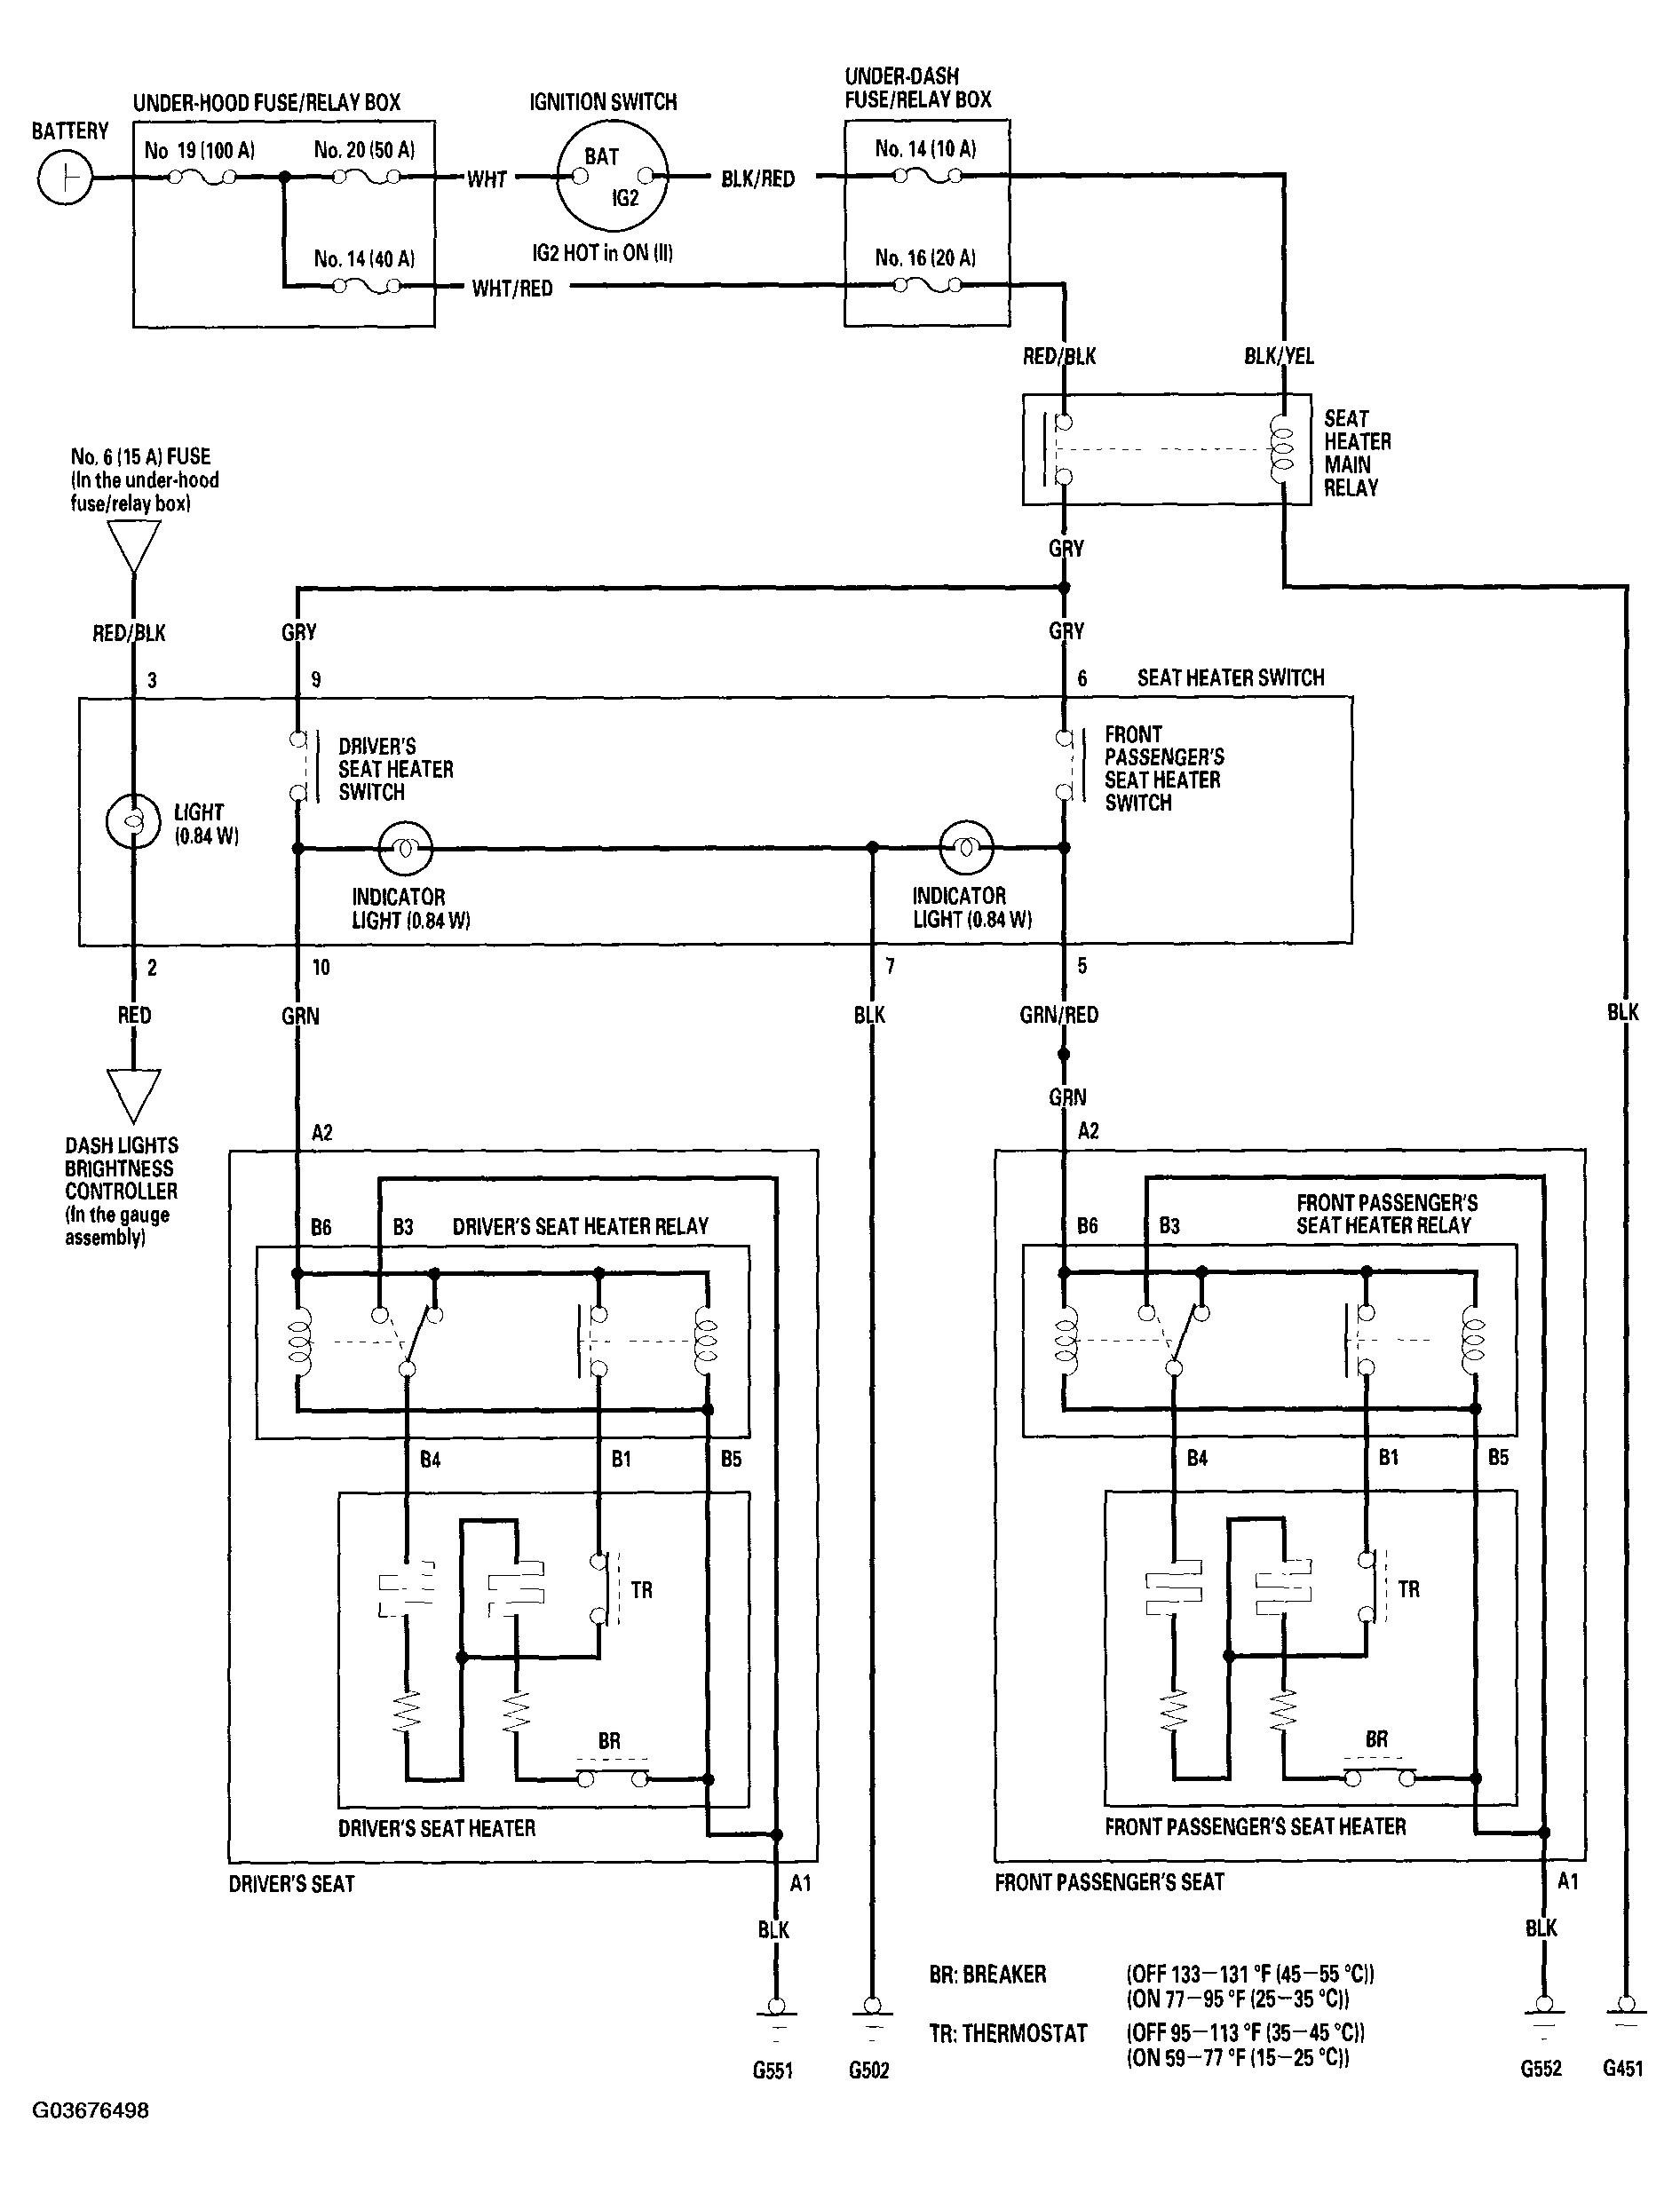 2005 honda accord fuse box diagram ford truck wiring diagrams 94 engine my